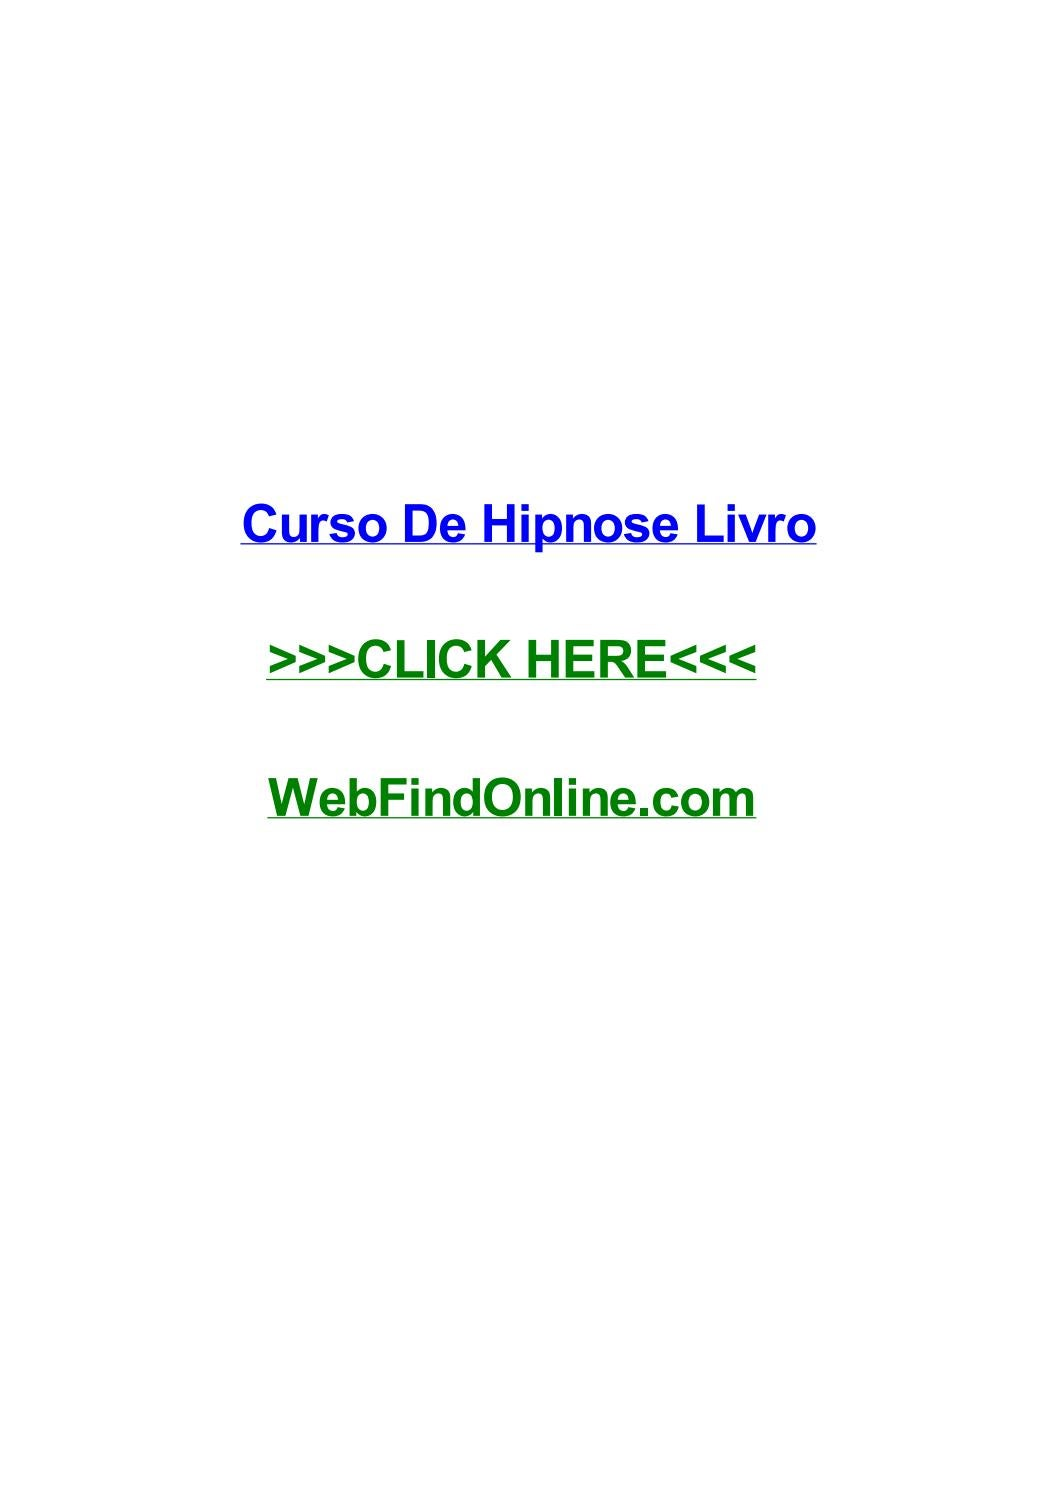 4aee20fa3 Curso de hipnose livro by marcusydbdi - issuu